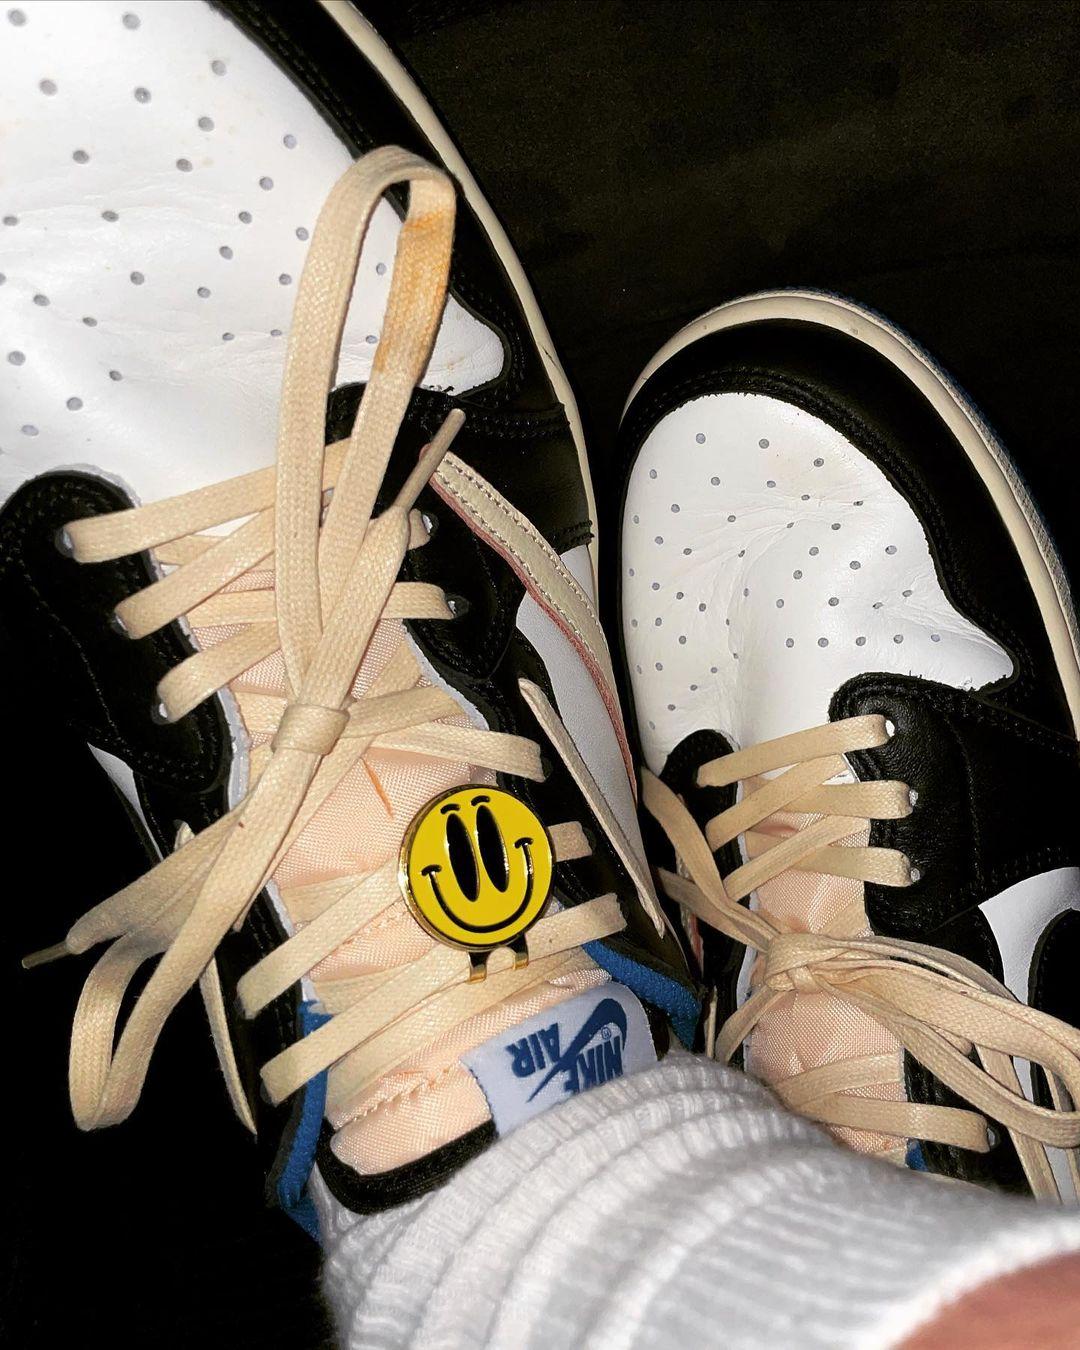 Air Jordan 1,AJ1,发售,Travis Sco  明日花、权志龙上脚闪电倒钩 AJ1!国内 SNKRS 终于上架!